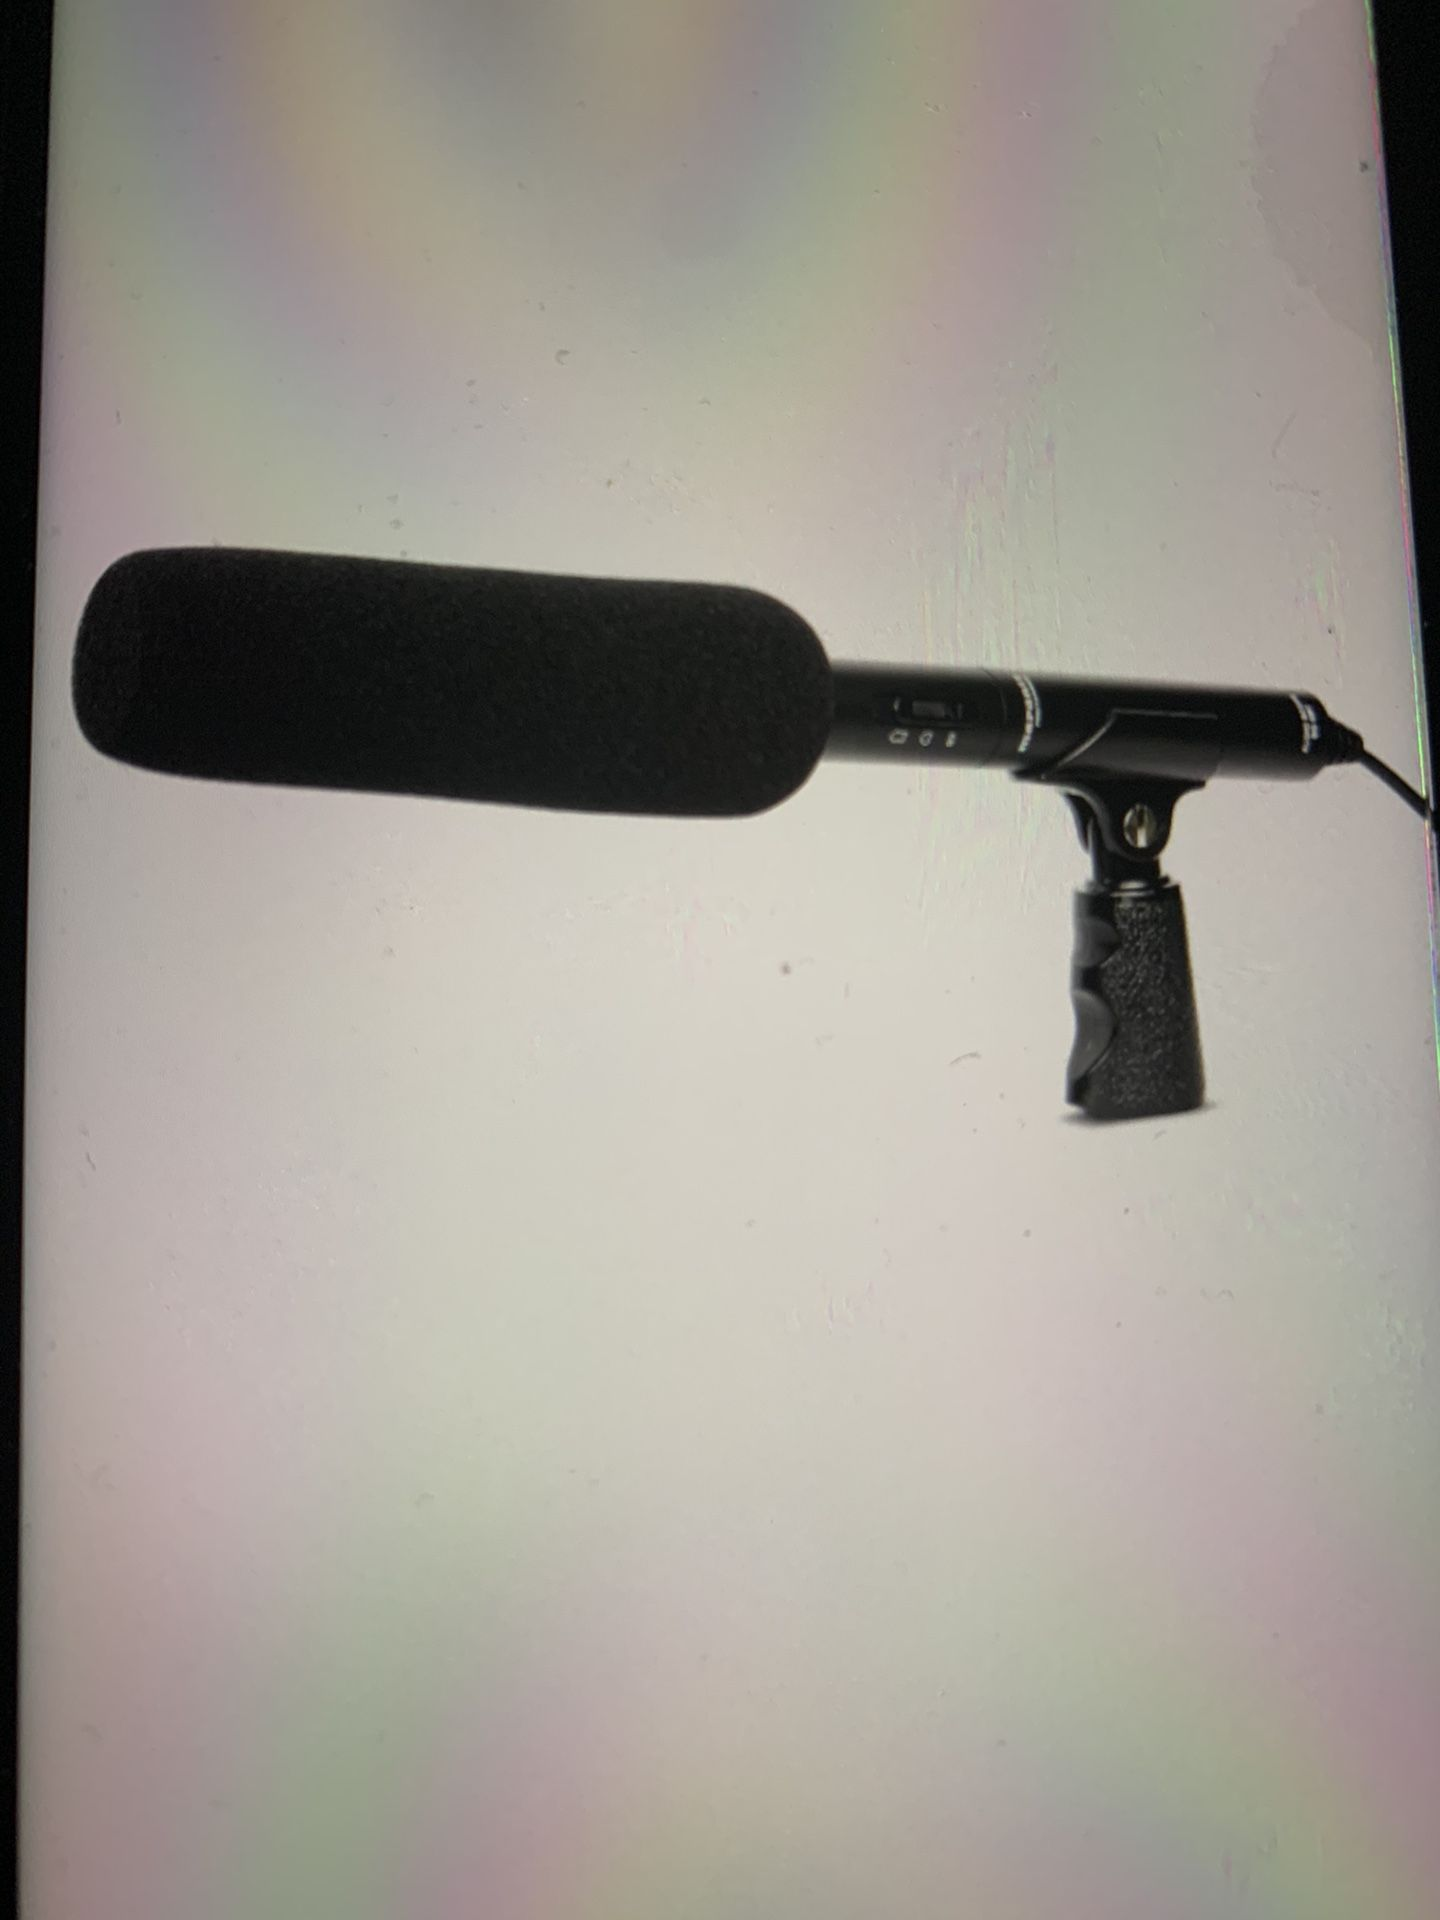 Marantz condenser camera microphone